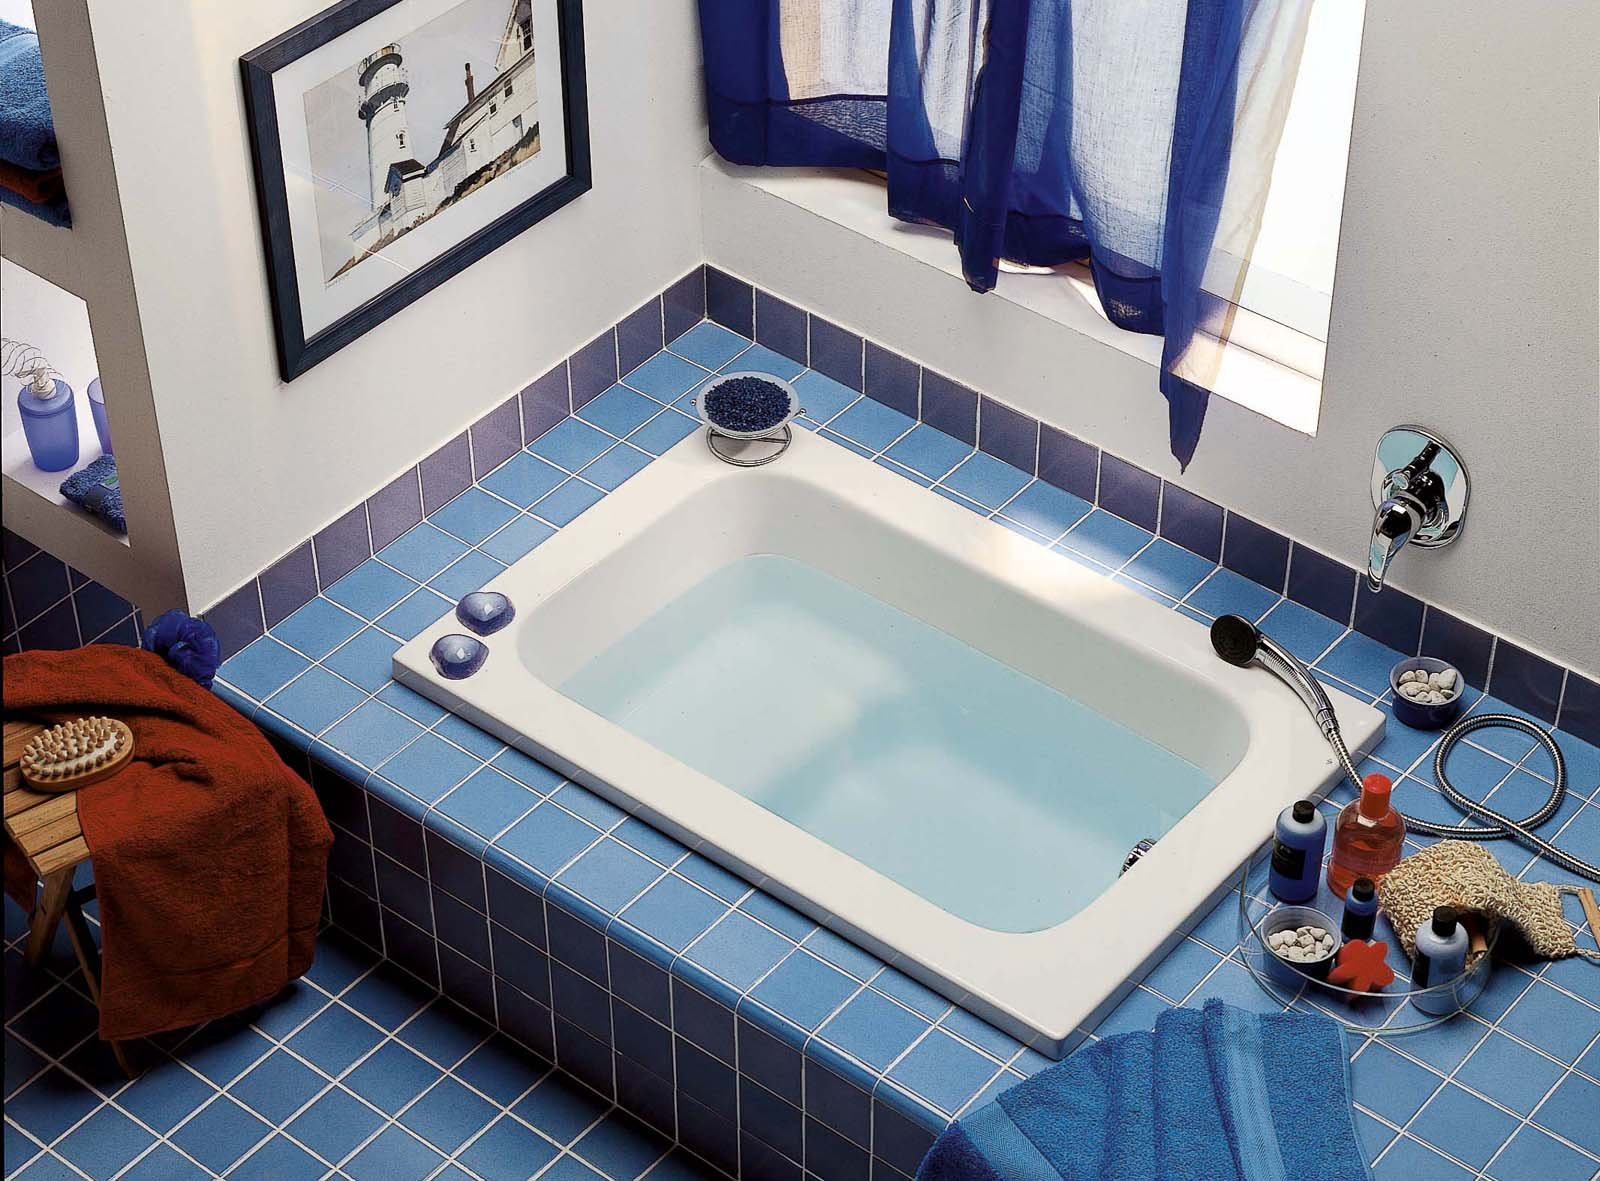 Vasca Da Bagno Tipologie : Vasche da bagno piccole cose di casa